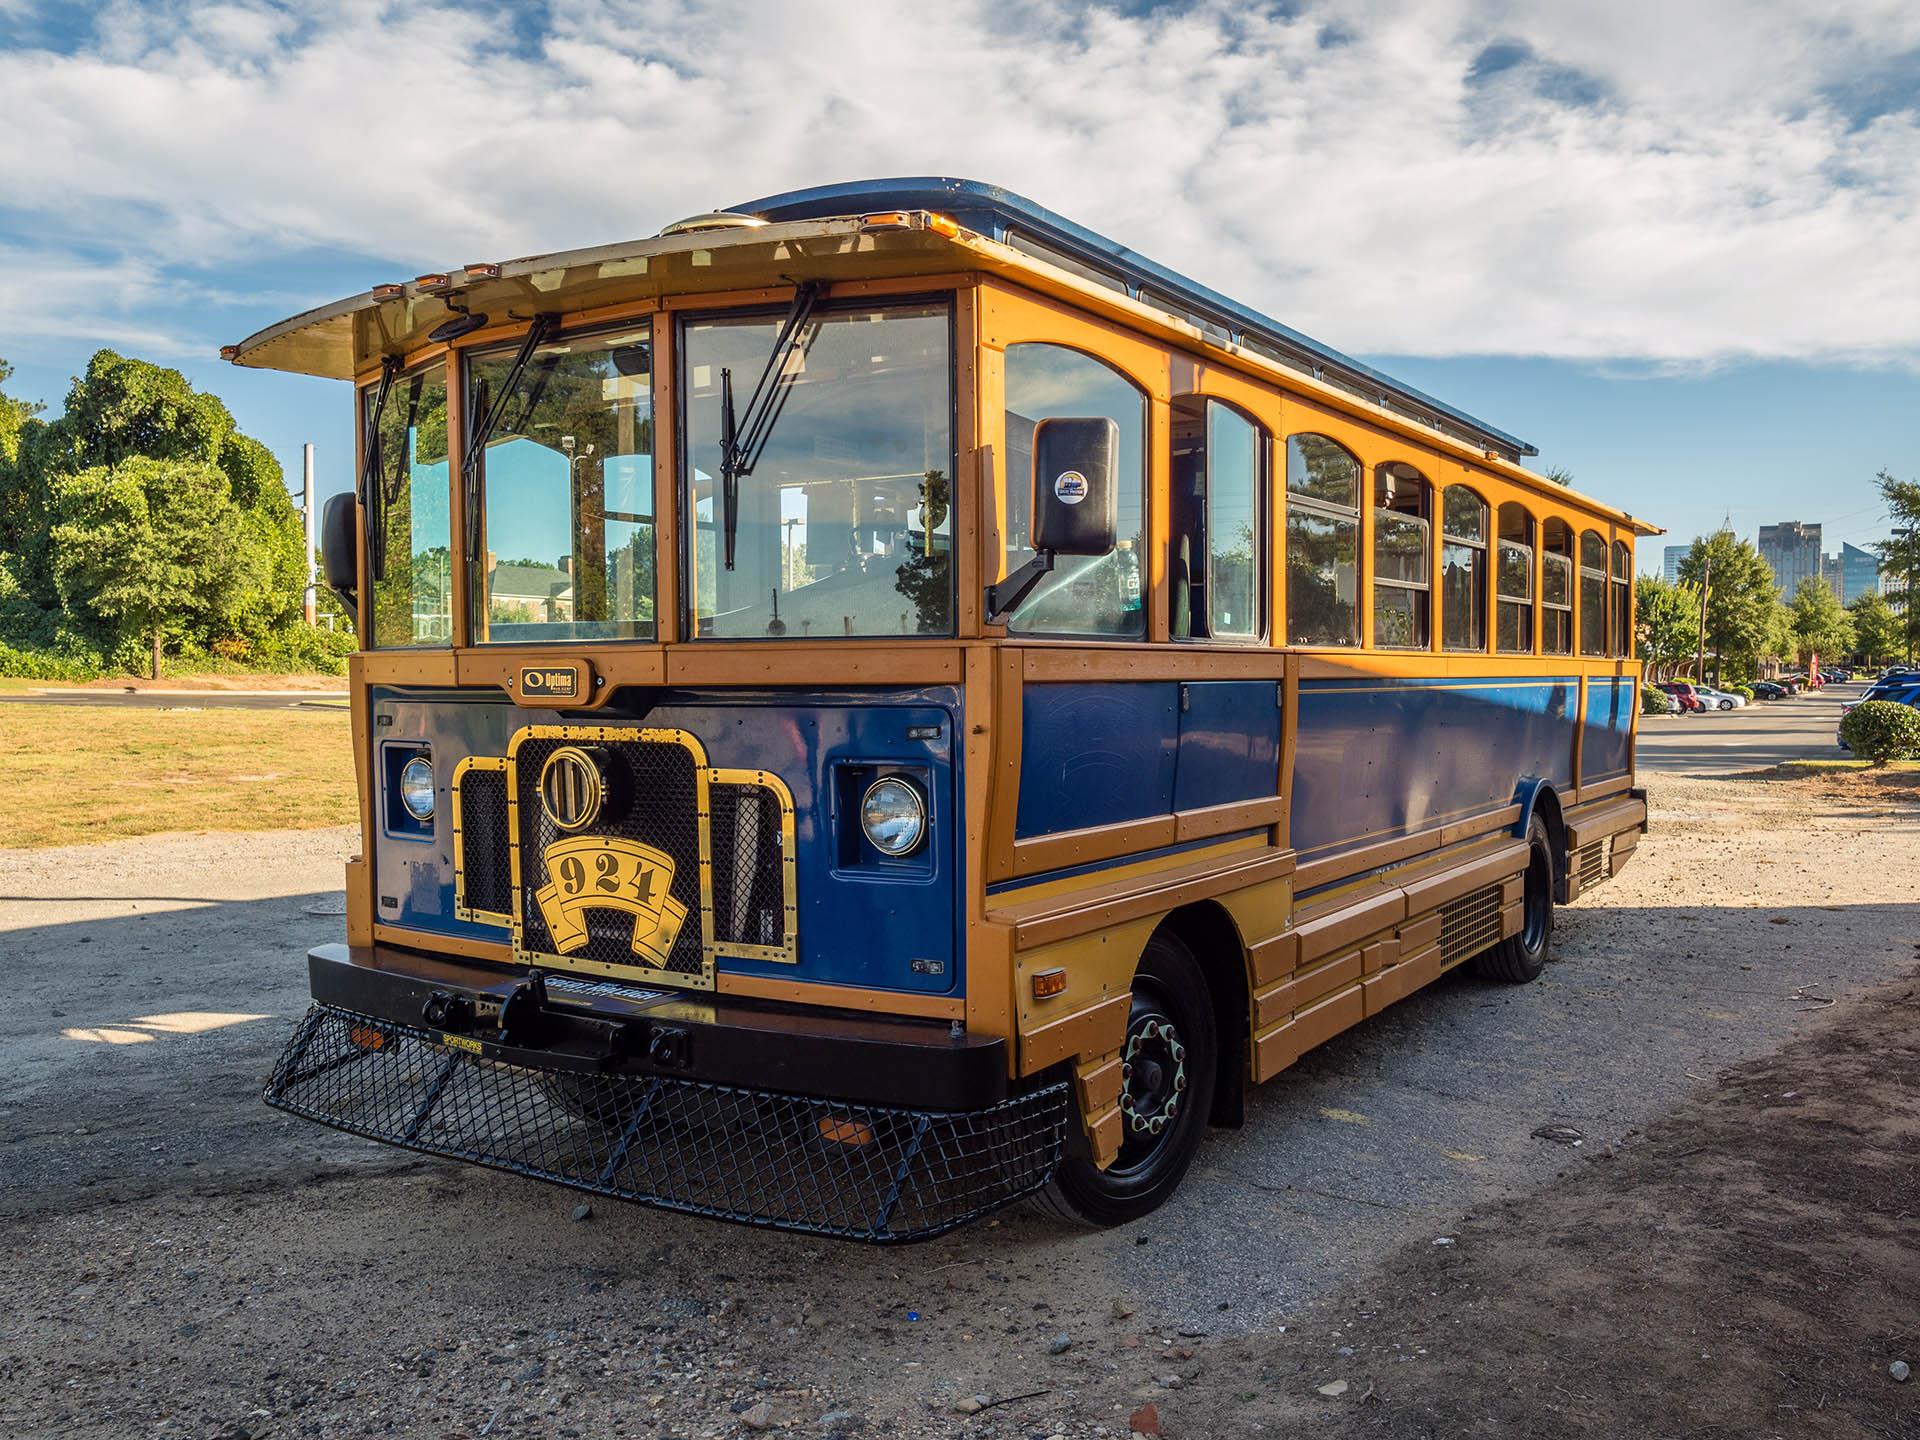 trolley main photo optimized.jpg